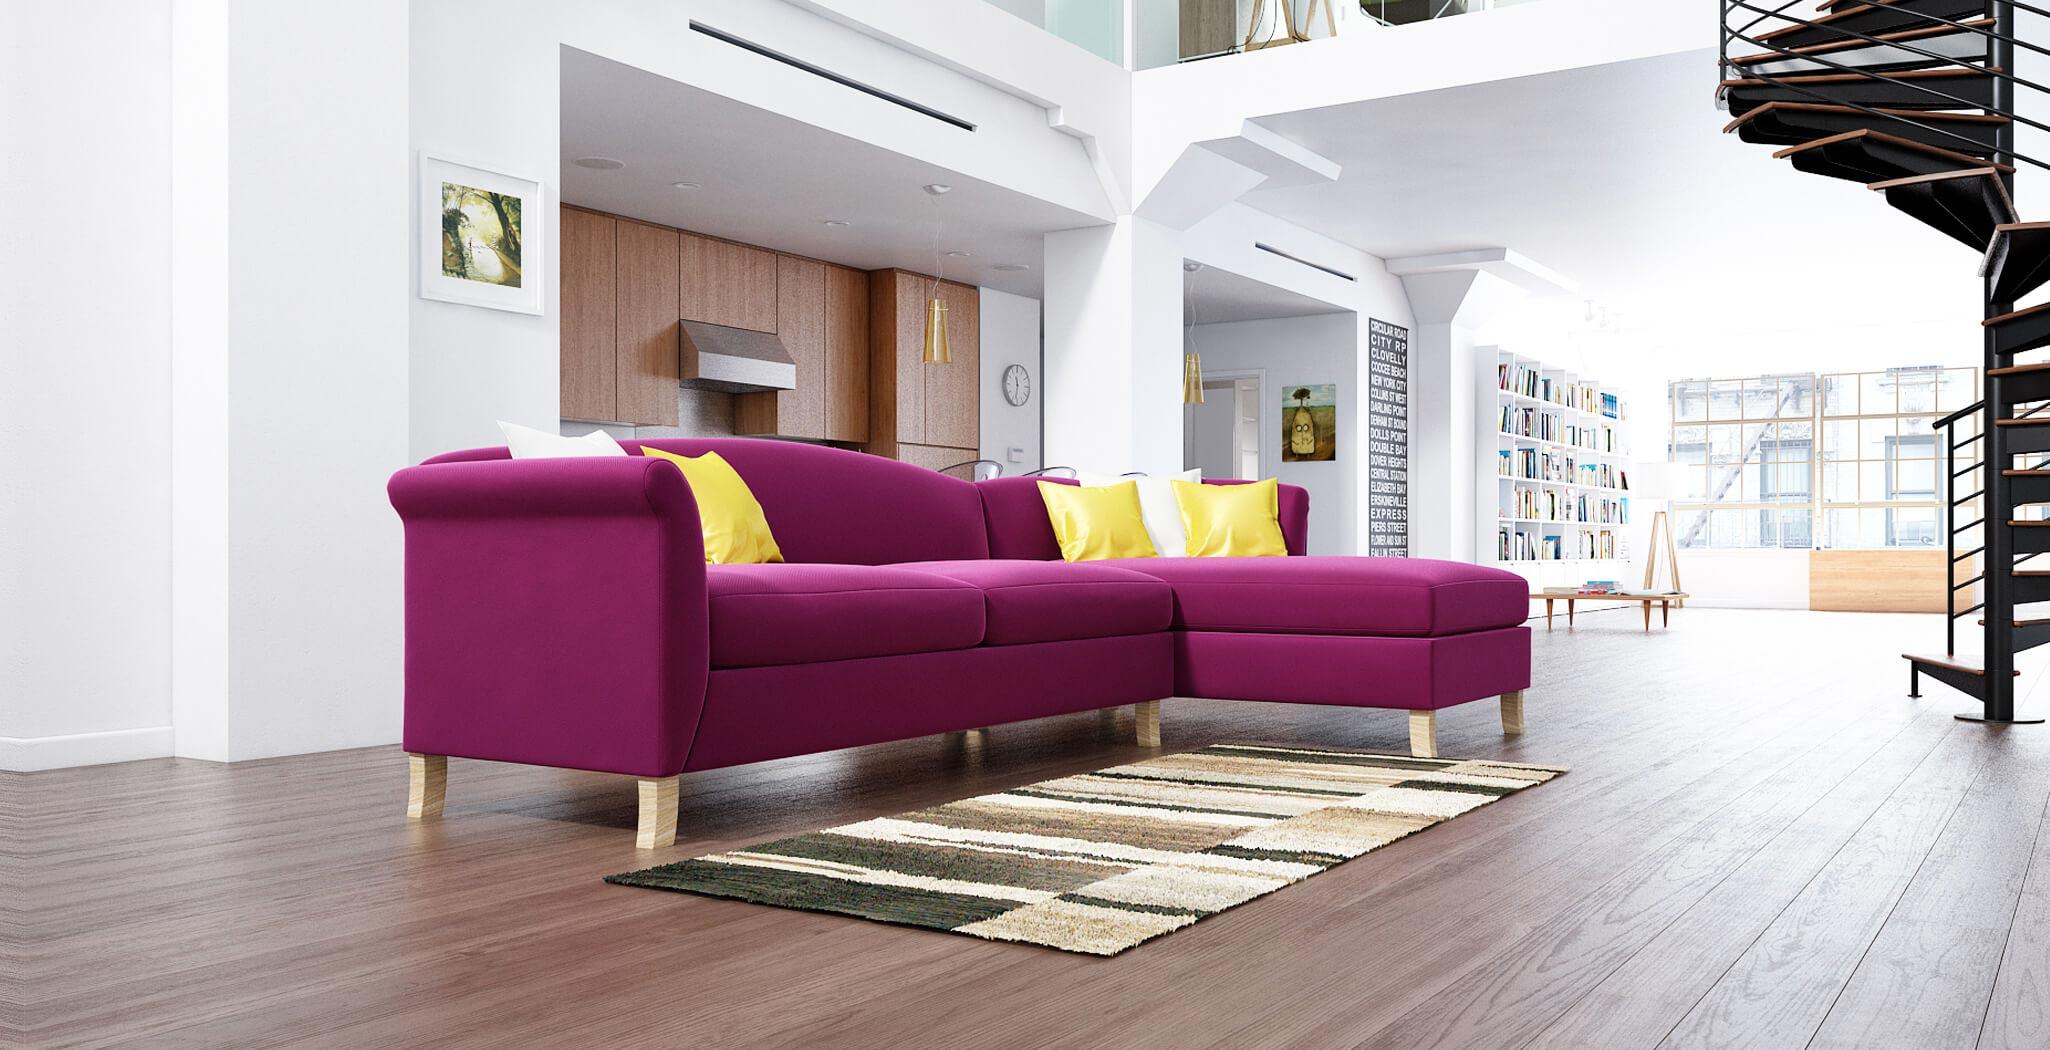 crete panel furniture gallery 3